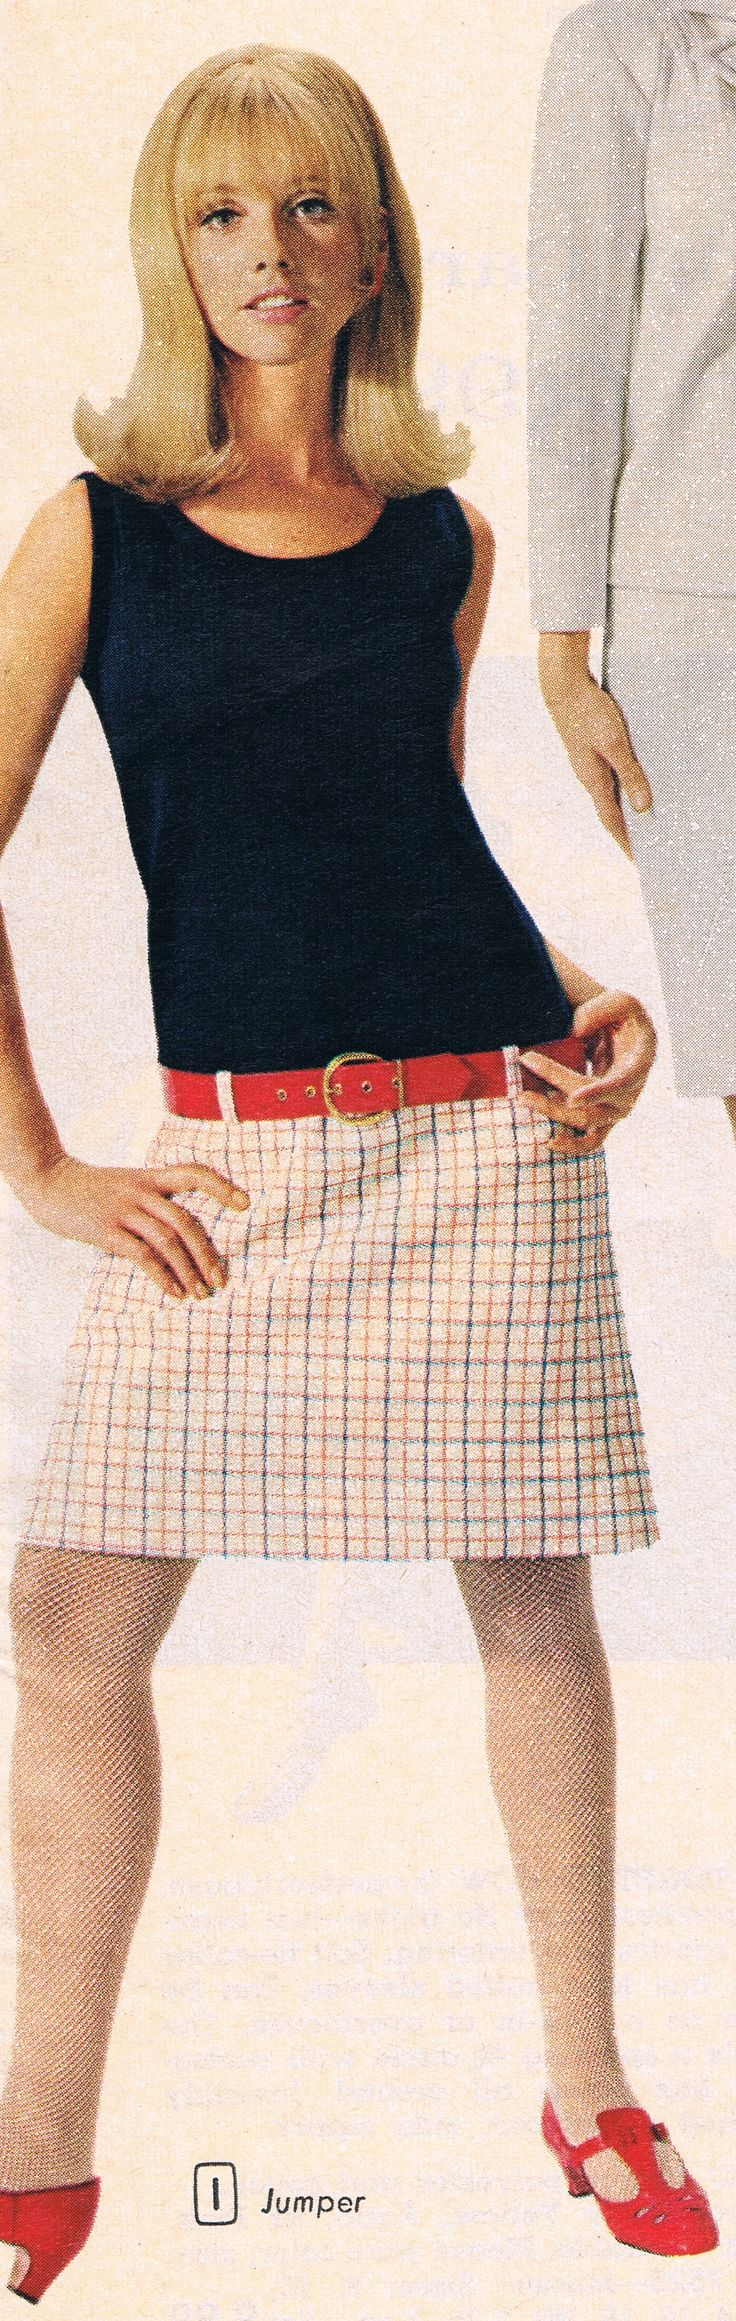 best sonya literski images on pinterest fashion vintage